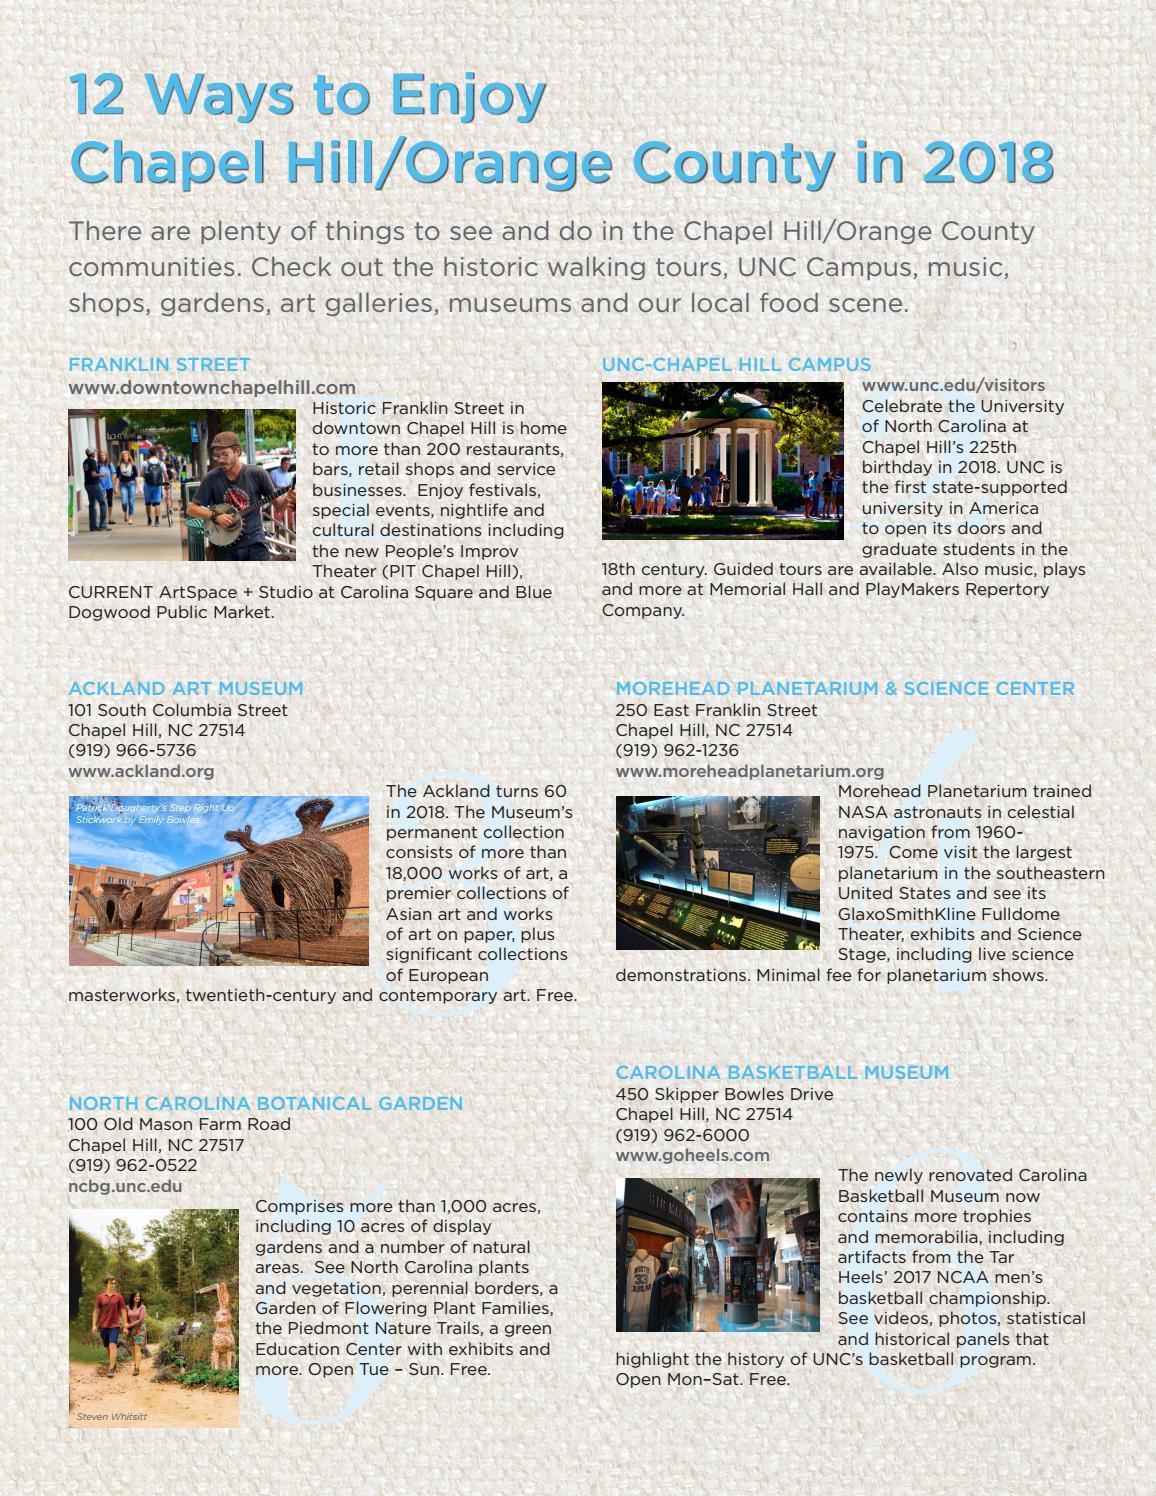 12 Ways to Enjoy Chapel Hill/Orange County, NC by Chapel